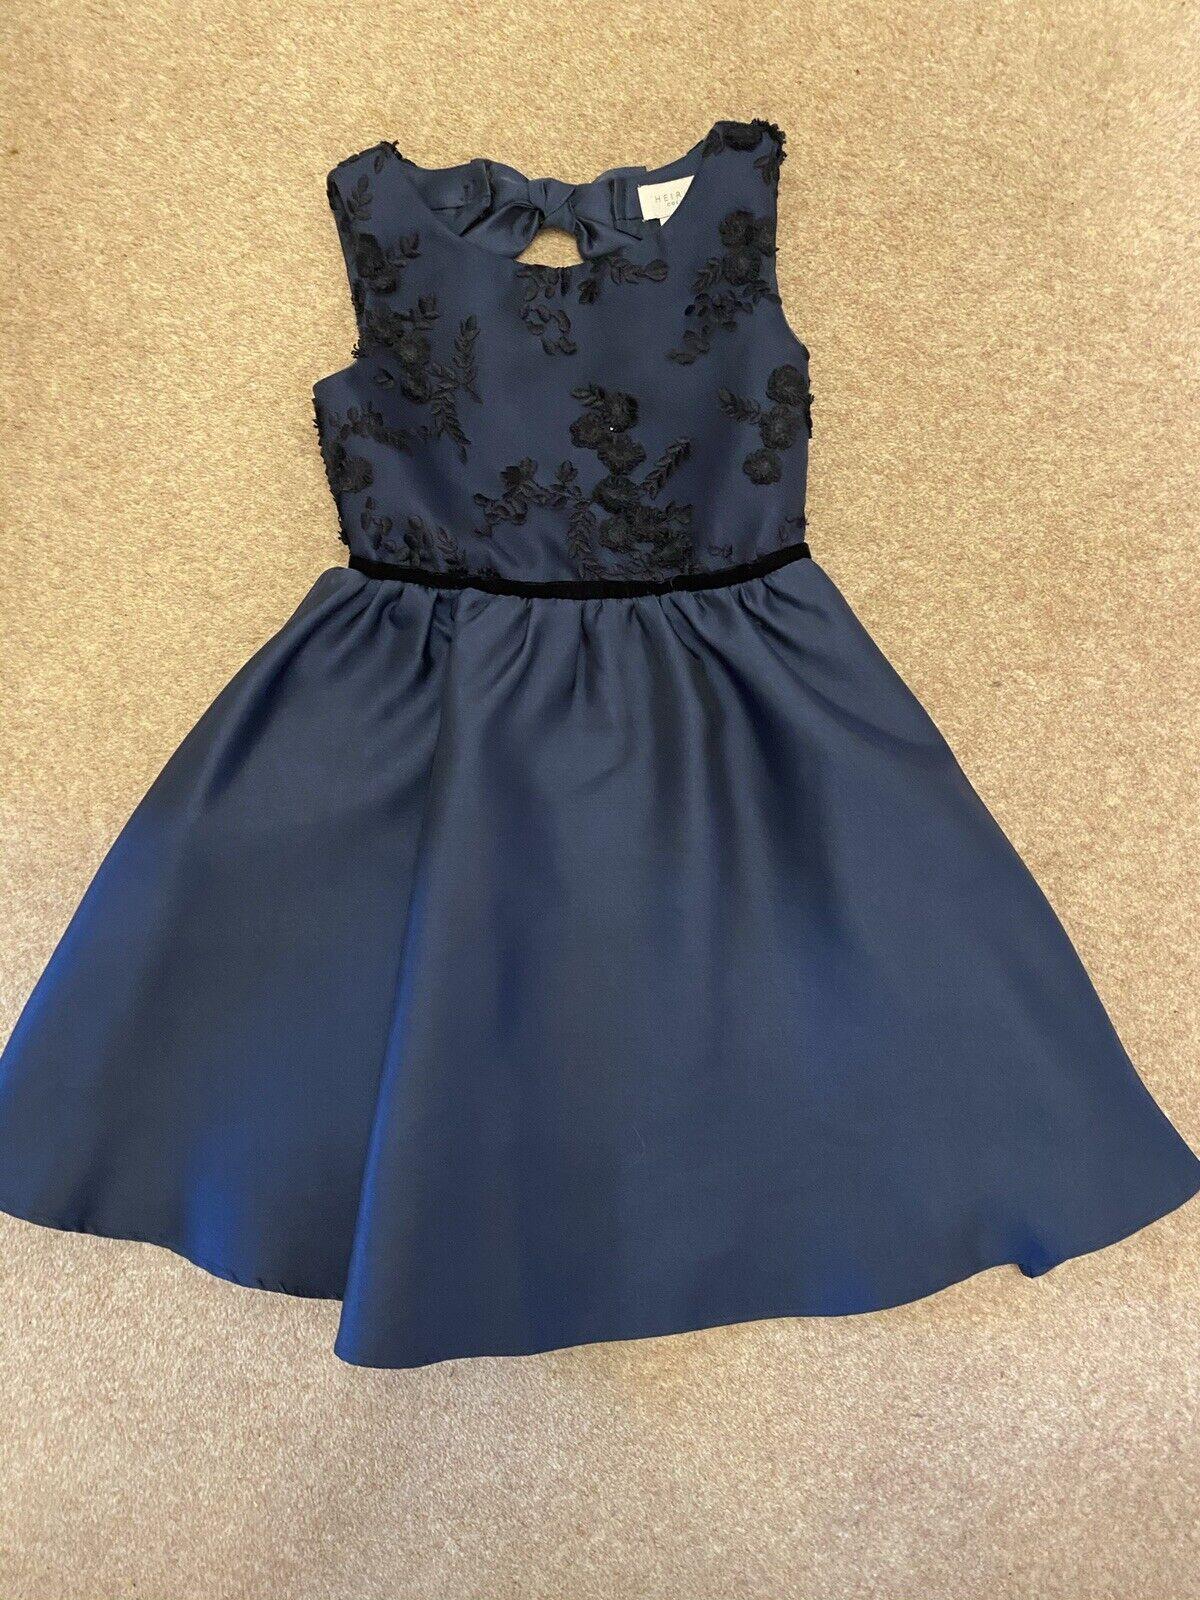 john lewis heirloom dress- Size 7